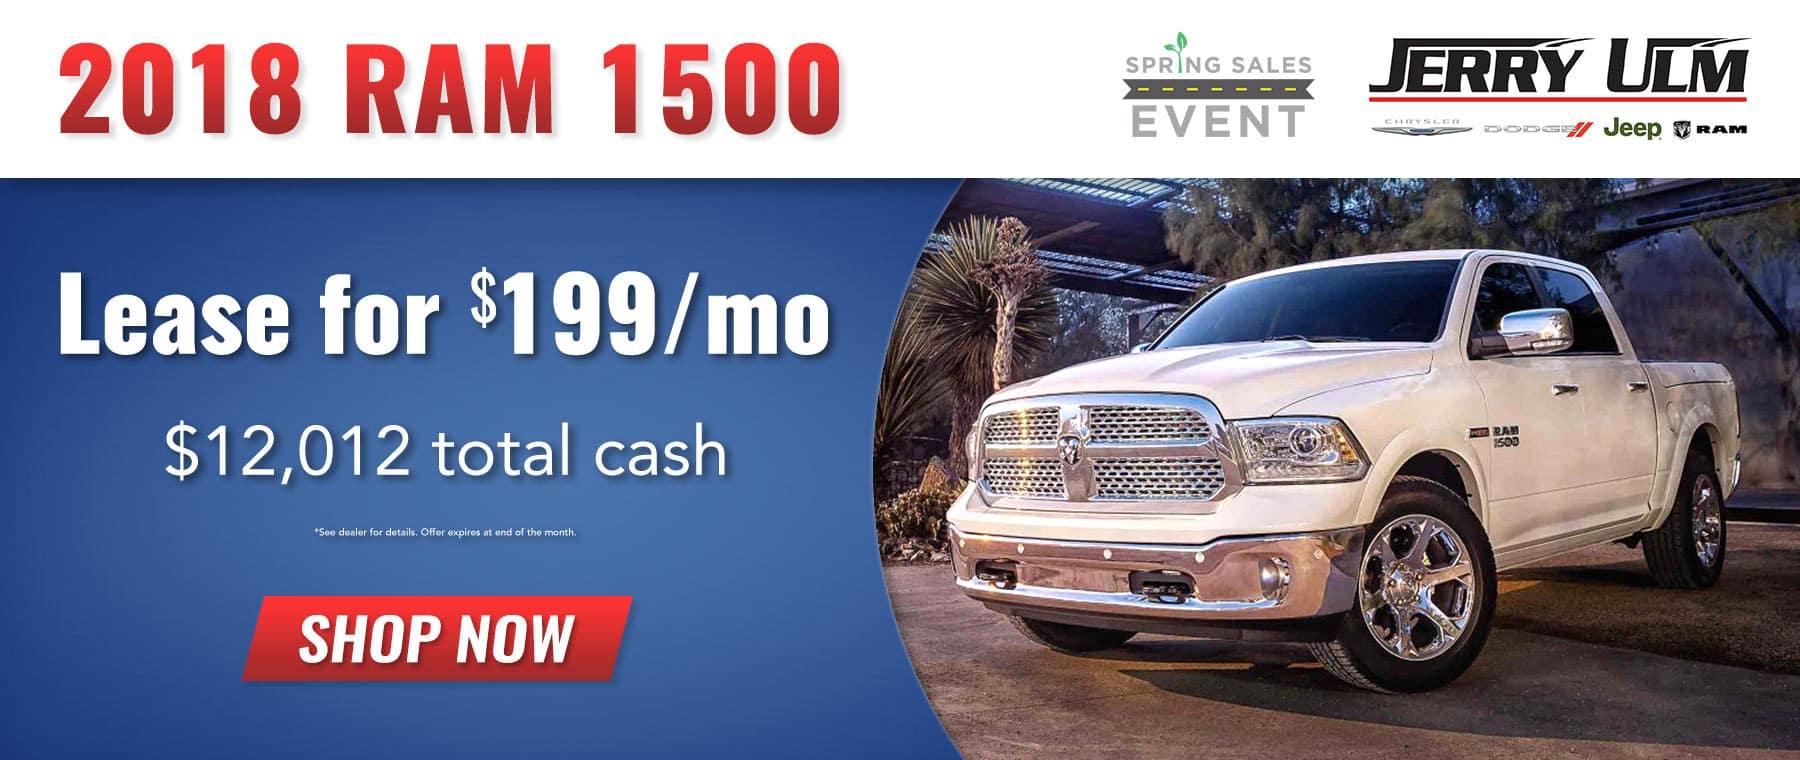 2018 RAM 1500 special